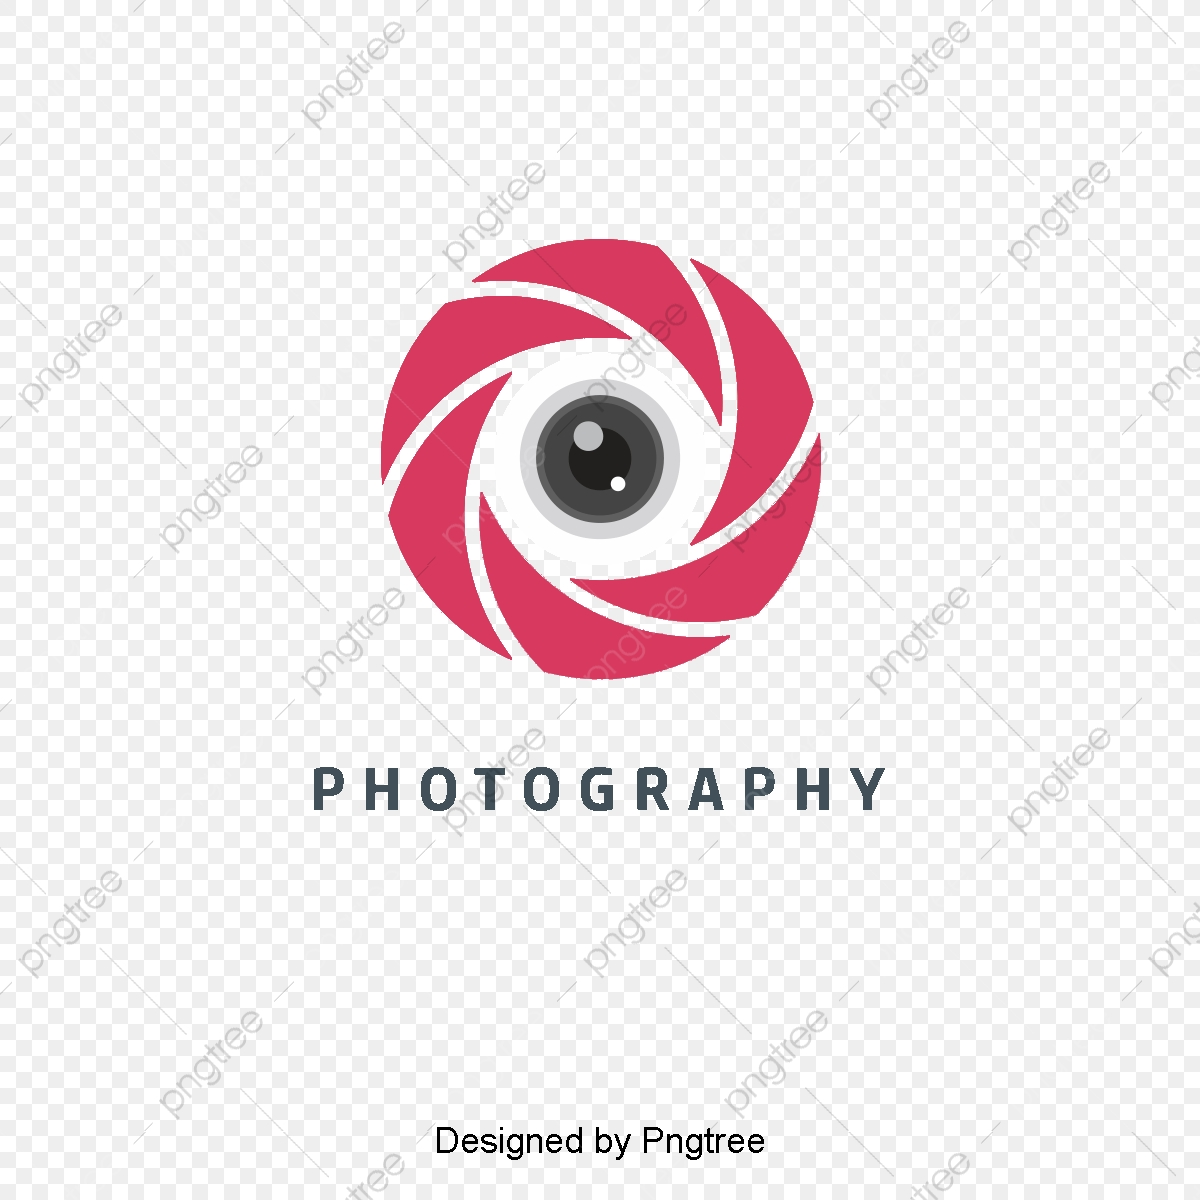 Red Camera Lens Vector, Camera Clipart, Red, Lens PNG Transparent.